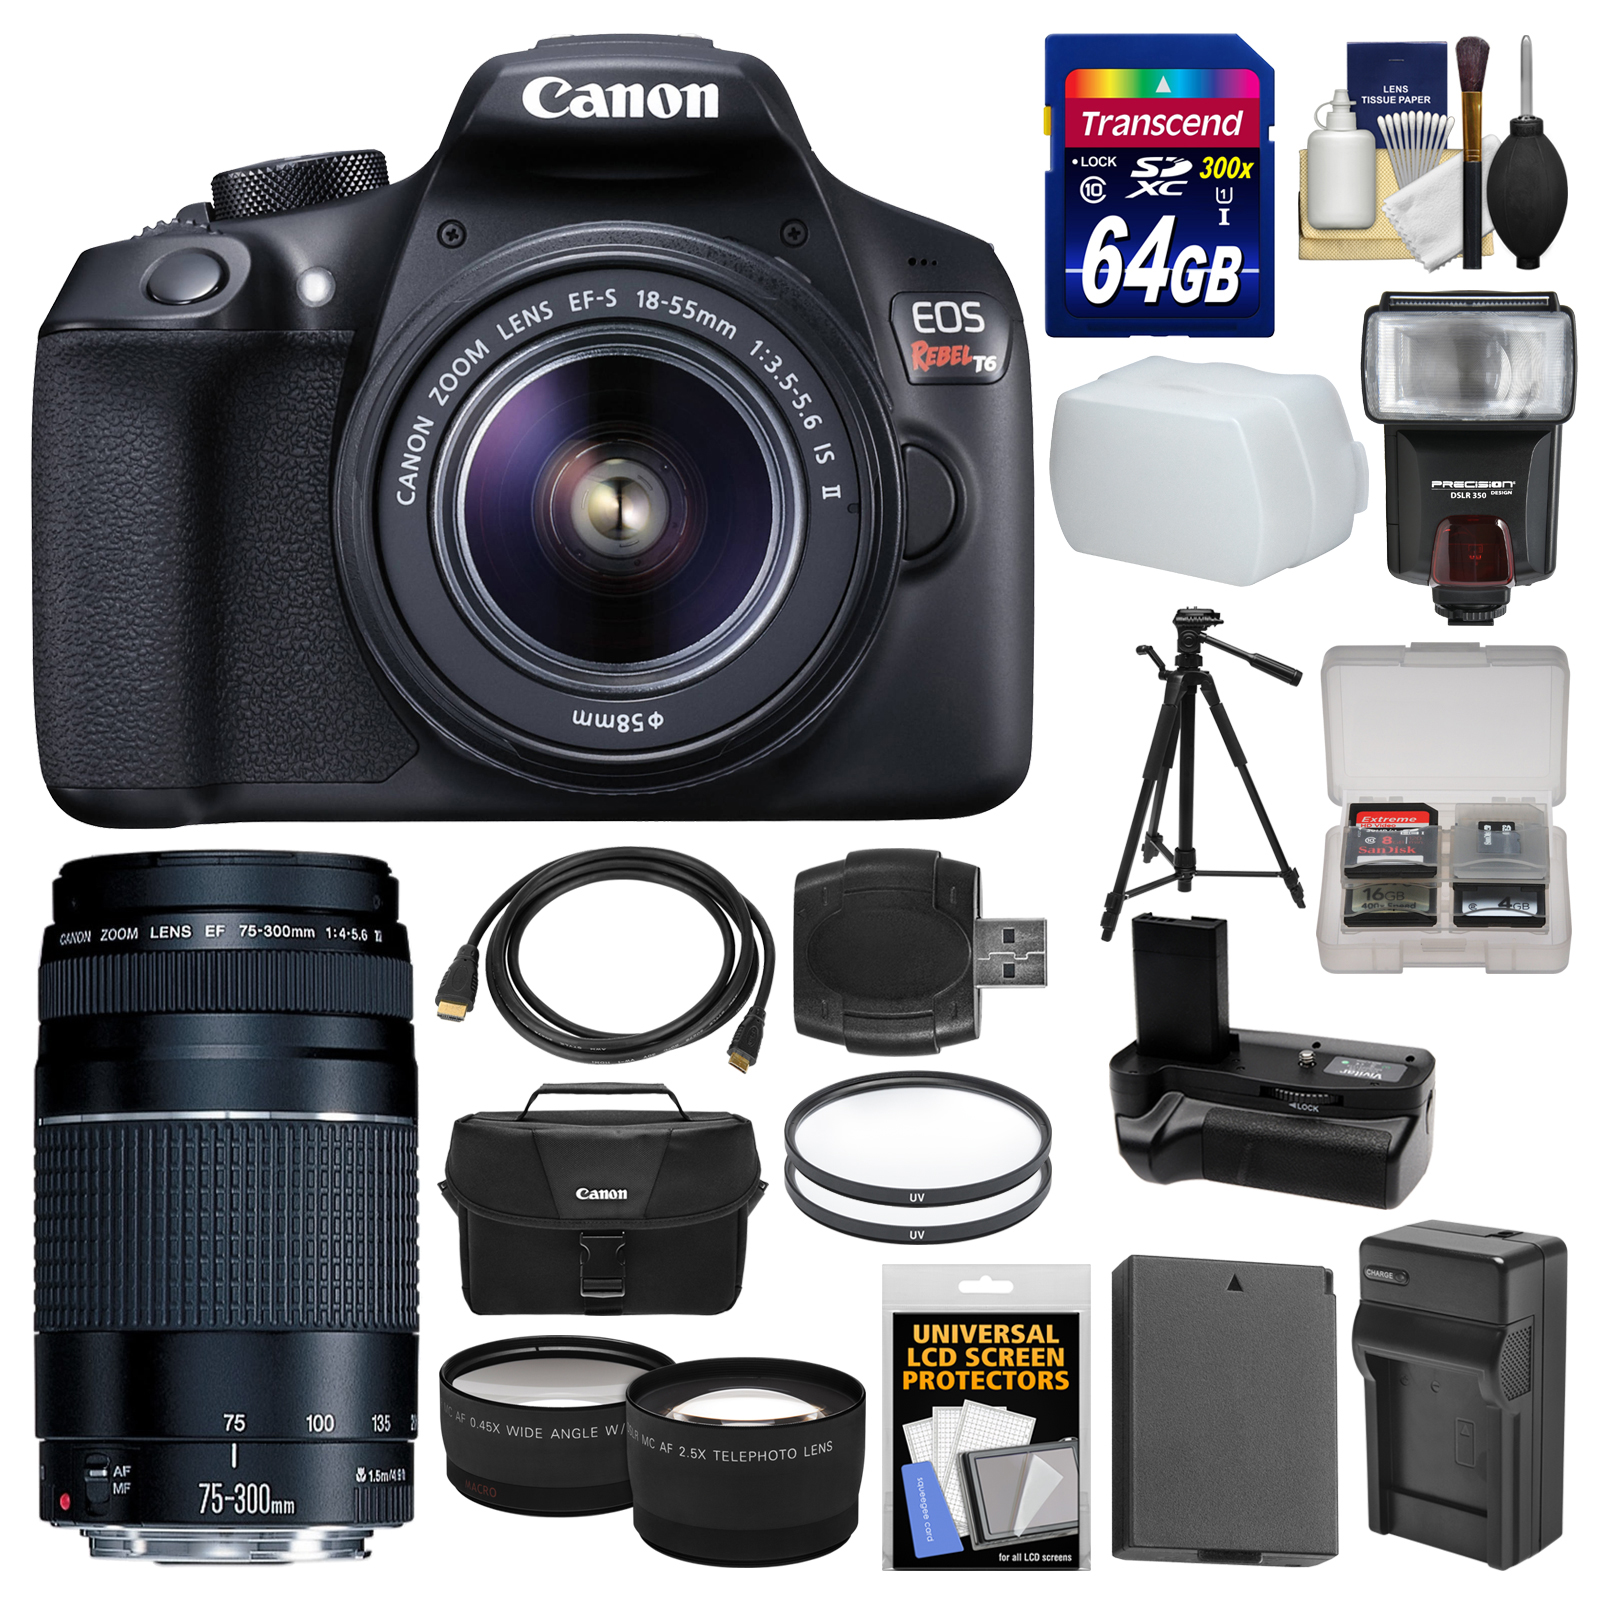 Canon EOS Rebel T6 Wi-Fi Digital SLR Camera & 18-55mm IS II + 75-300mm III Lens + 64GB Card + Case + Flash + Battery & Charger + Grip + Tripod Kit